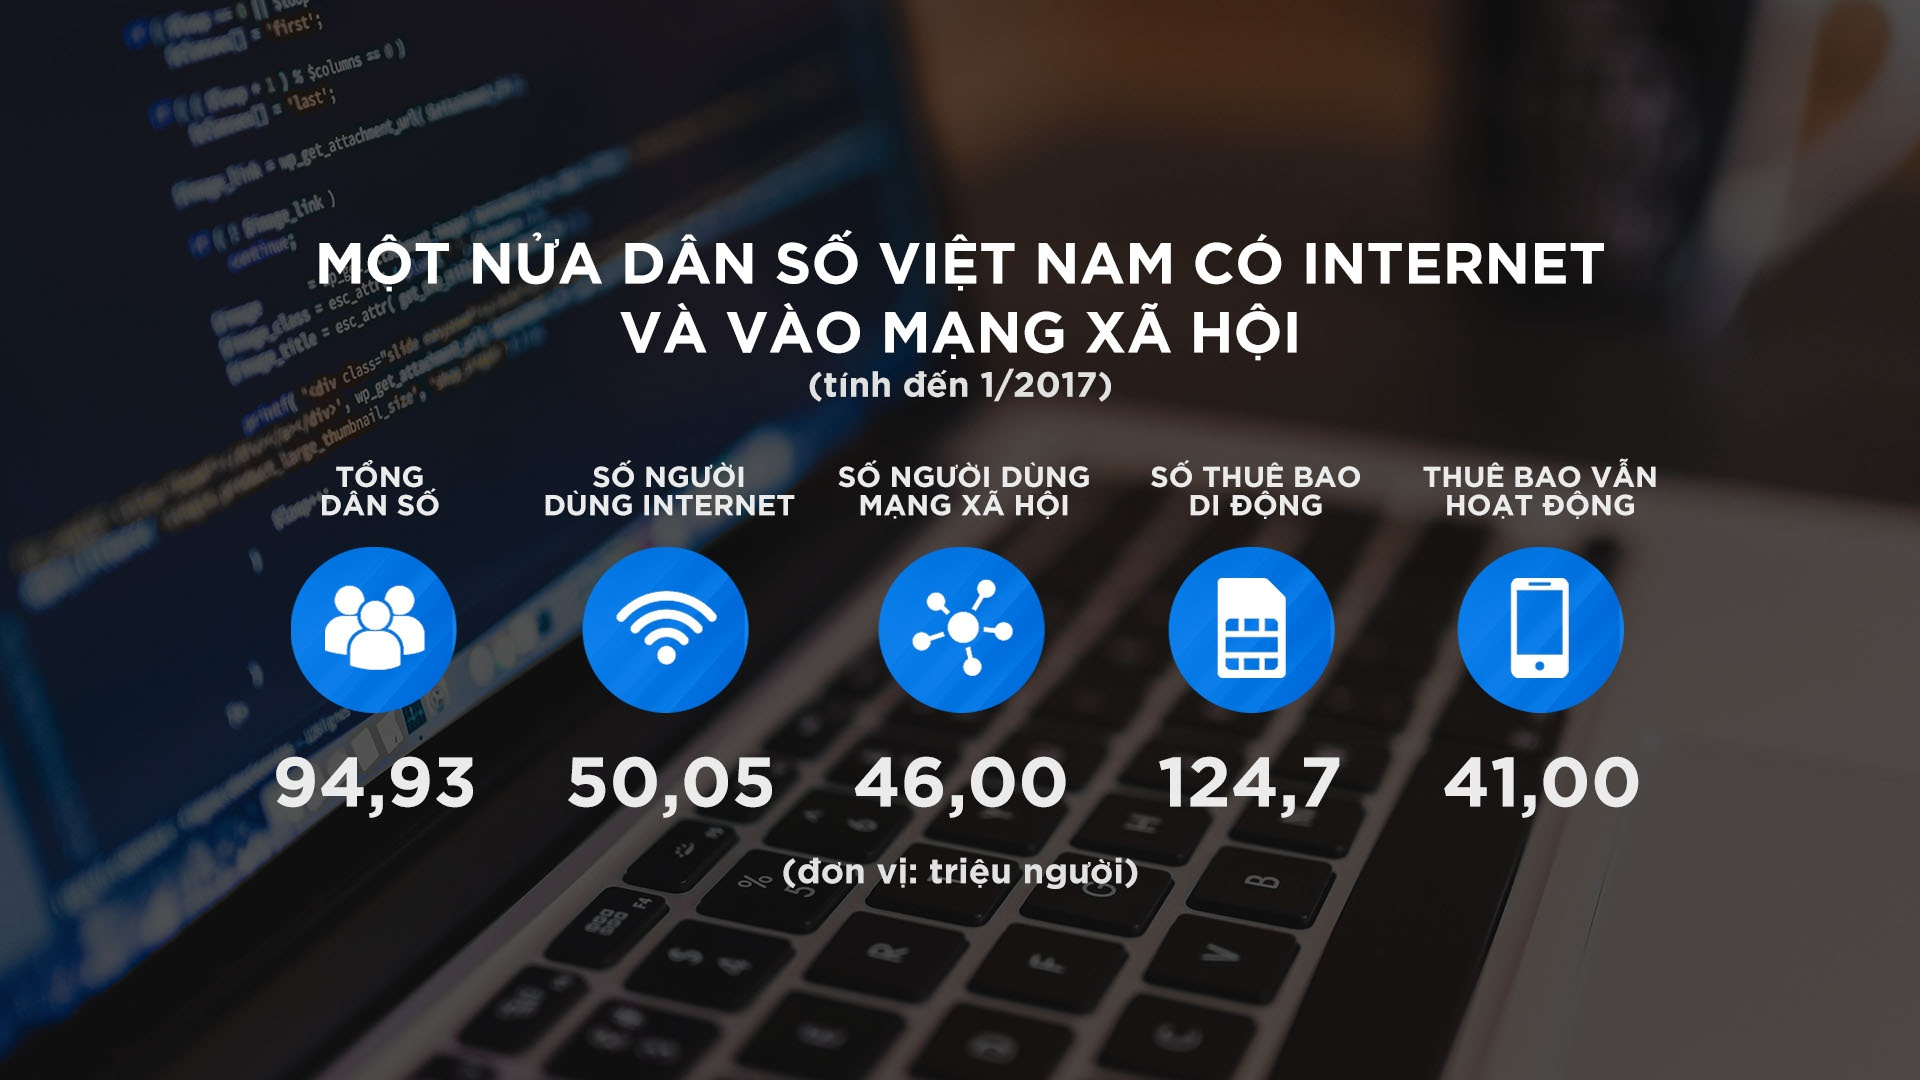 20 nam Internet Viet Nam anh 13